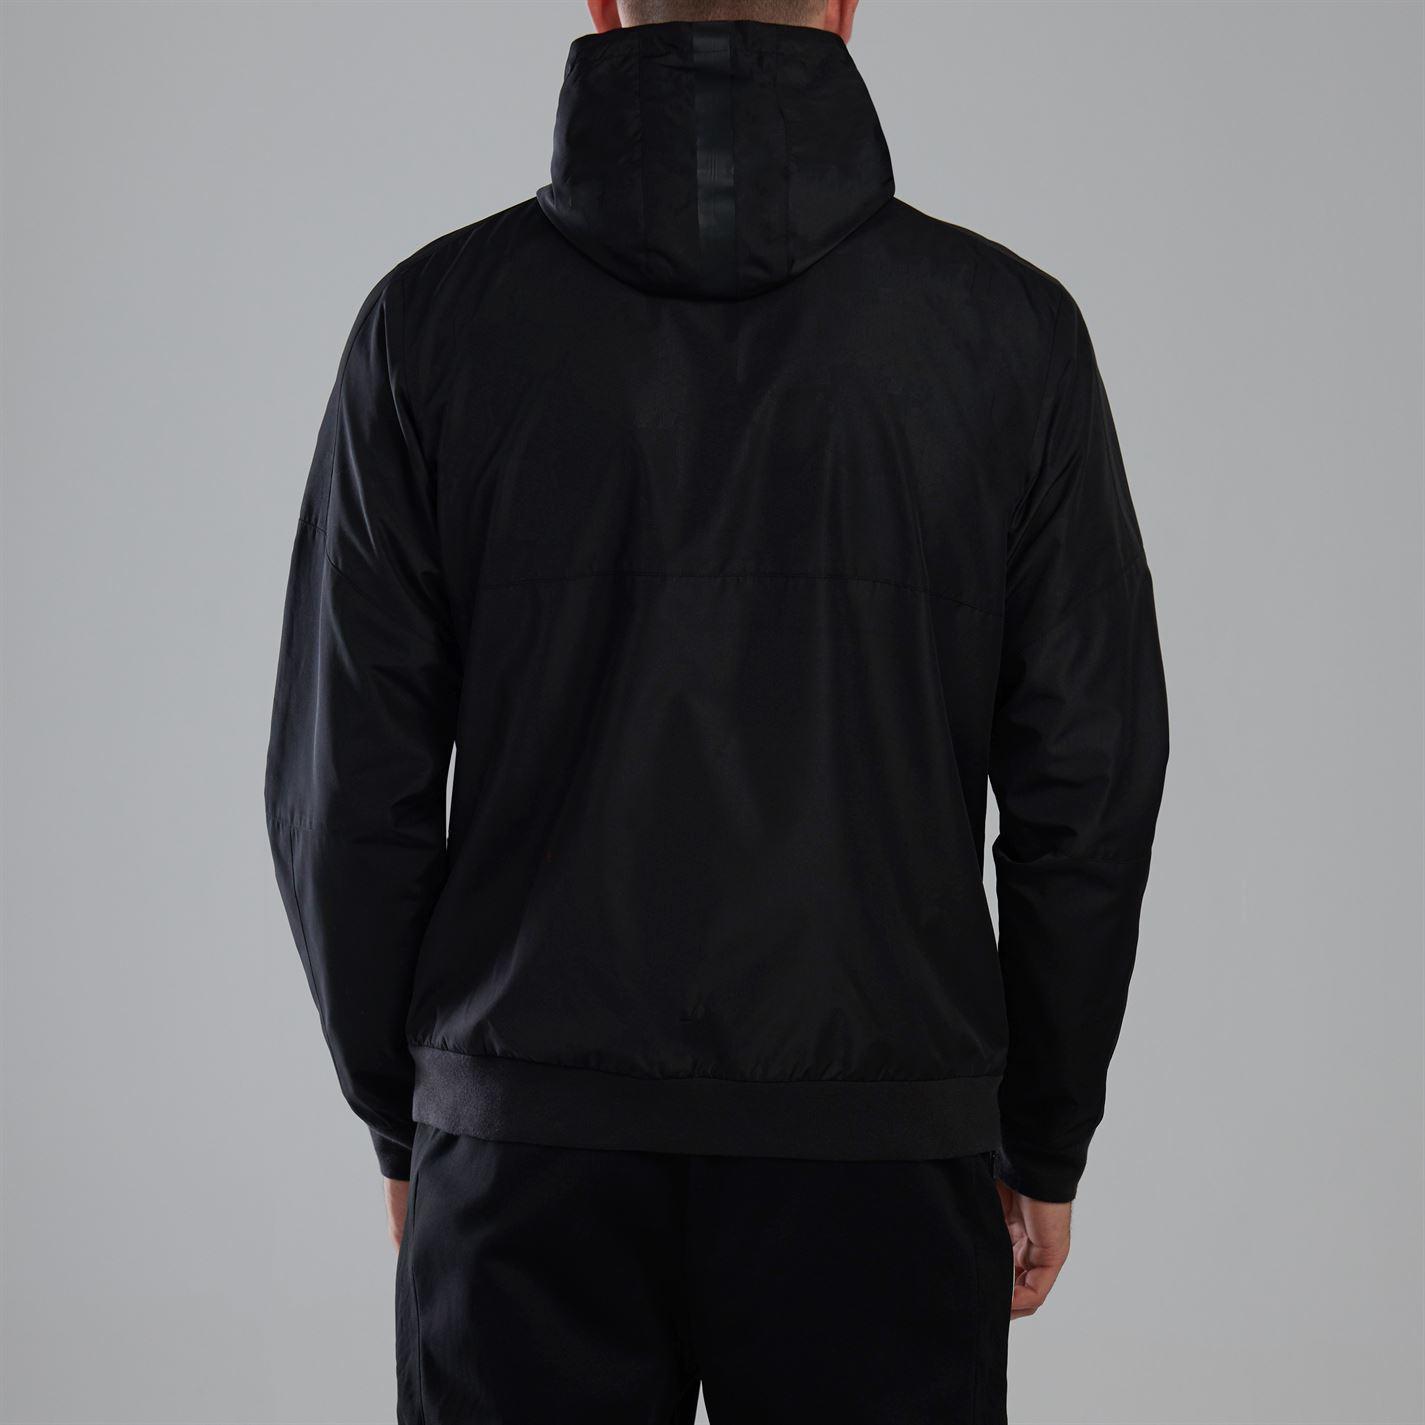 Five Mens Stadium Wind Runner Jacket Rain Coat Top  d45adc537